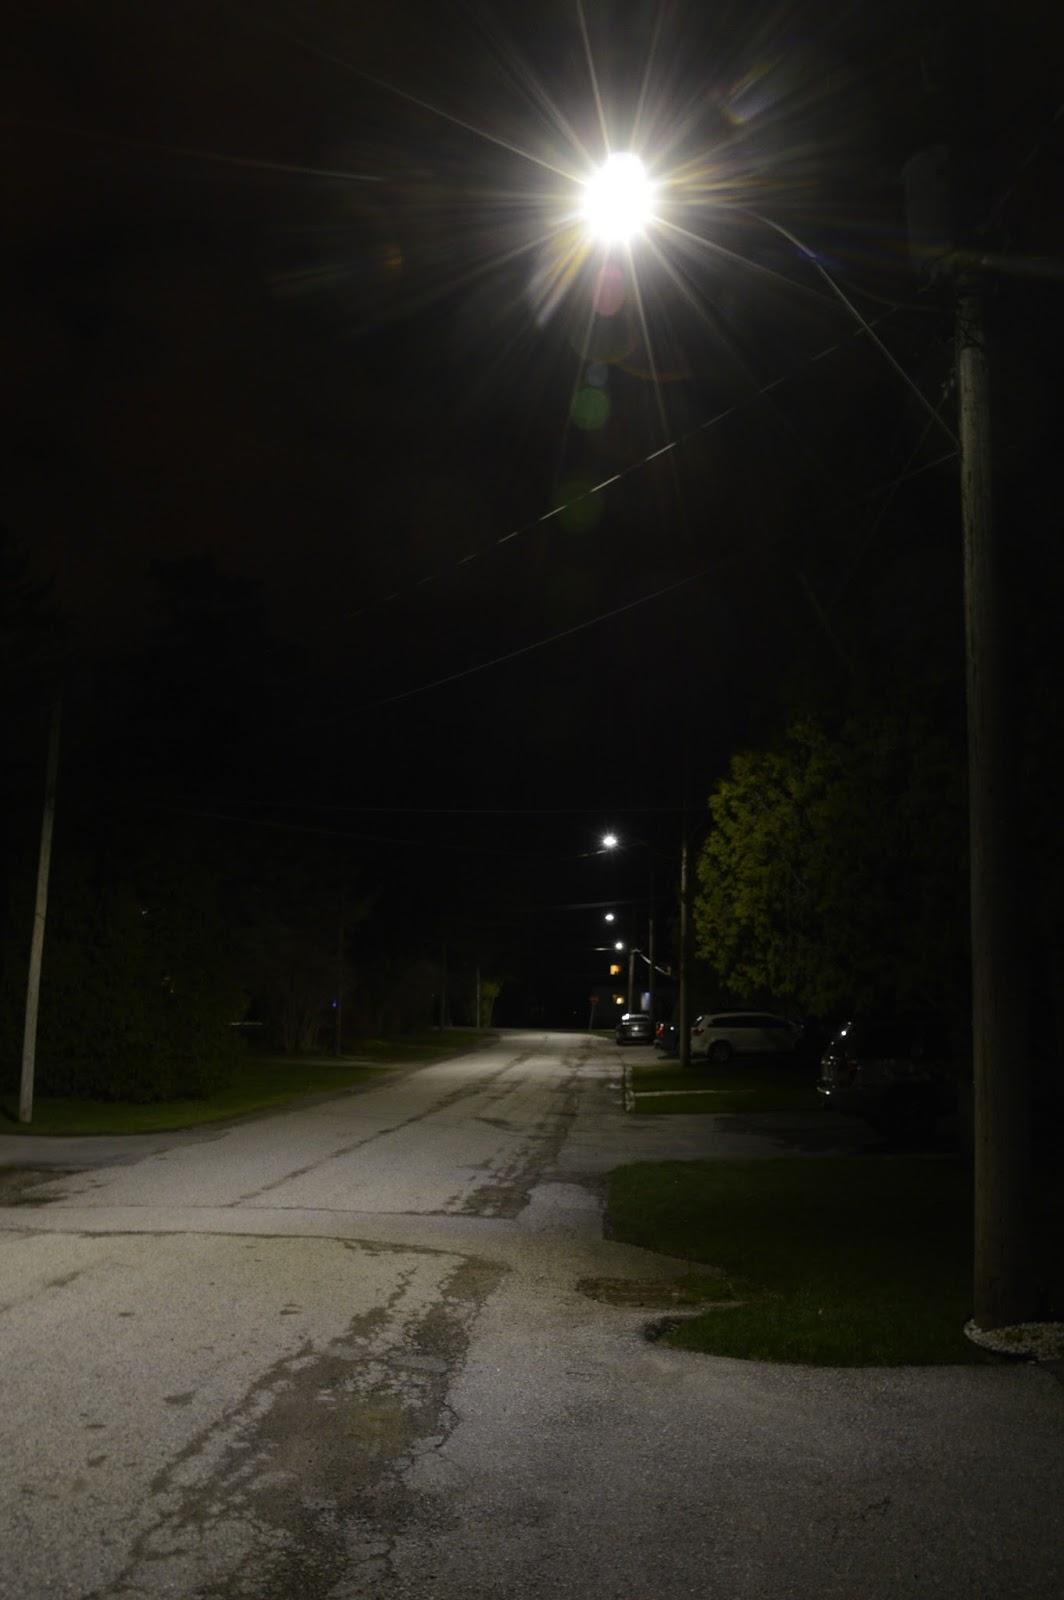 lighting to new the led brighter cardiffian lights get thecardiffian butetown street streetlights